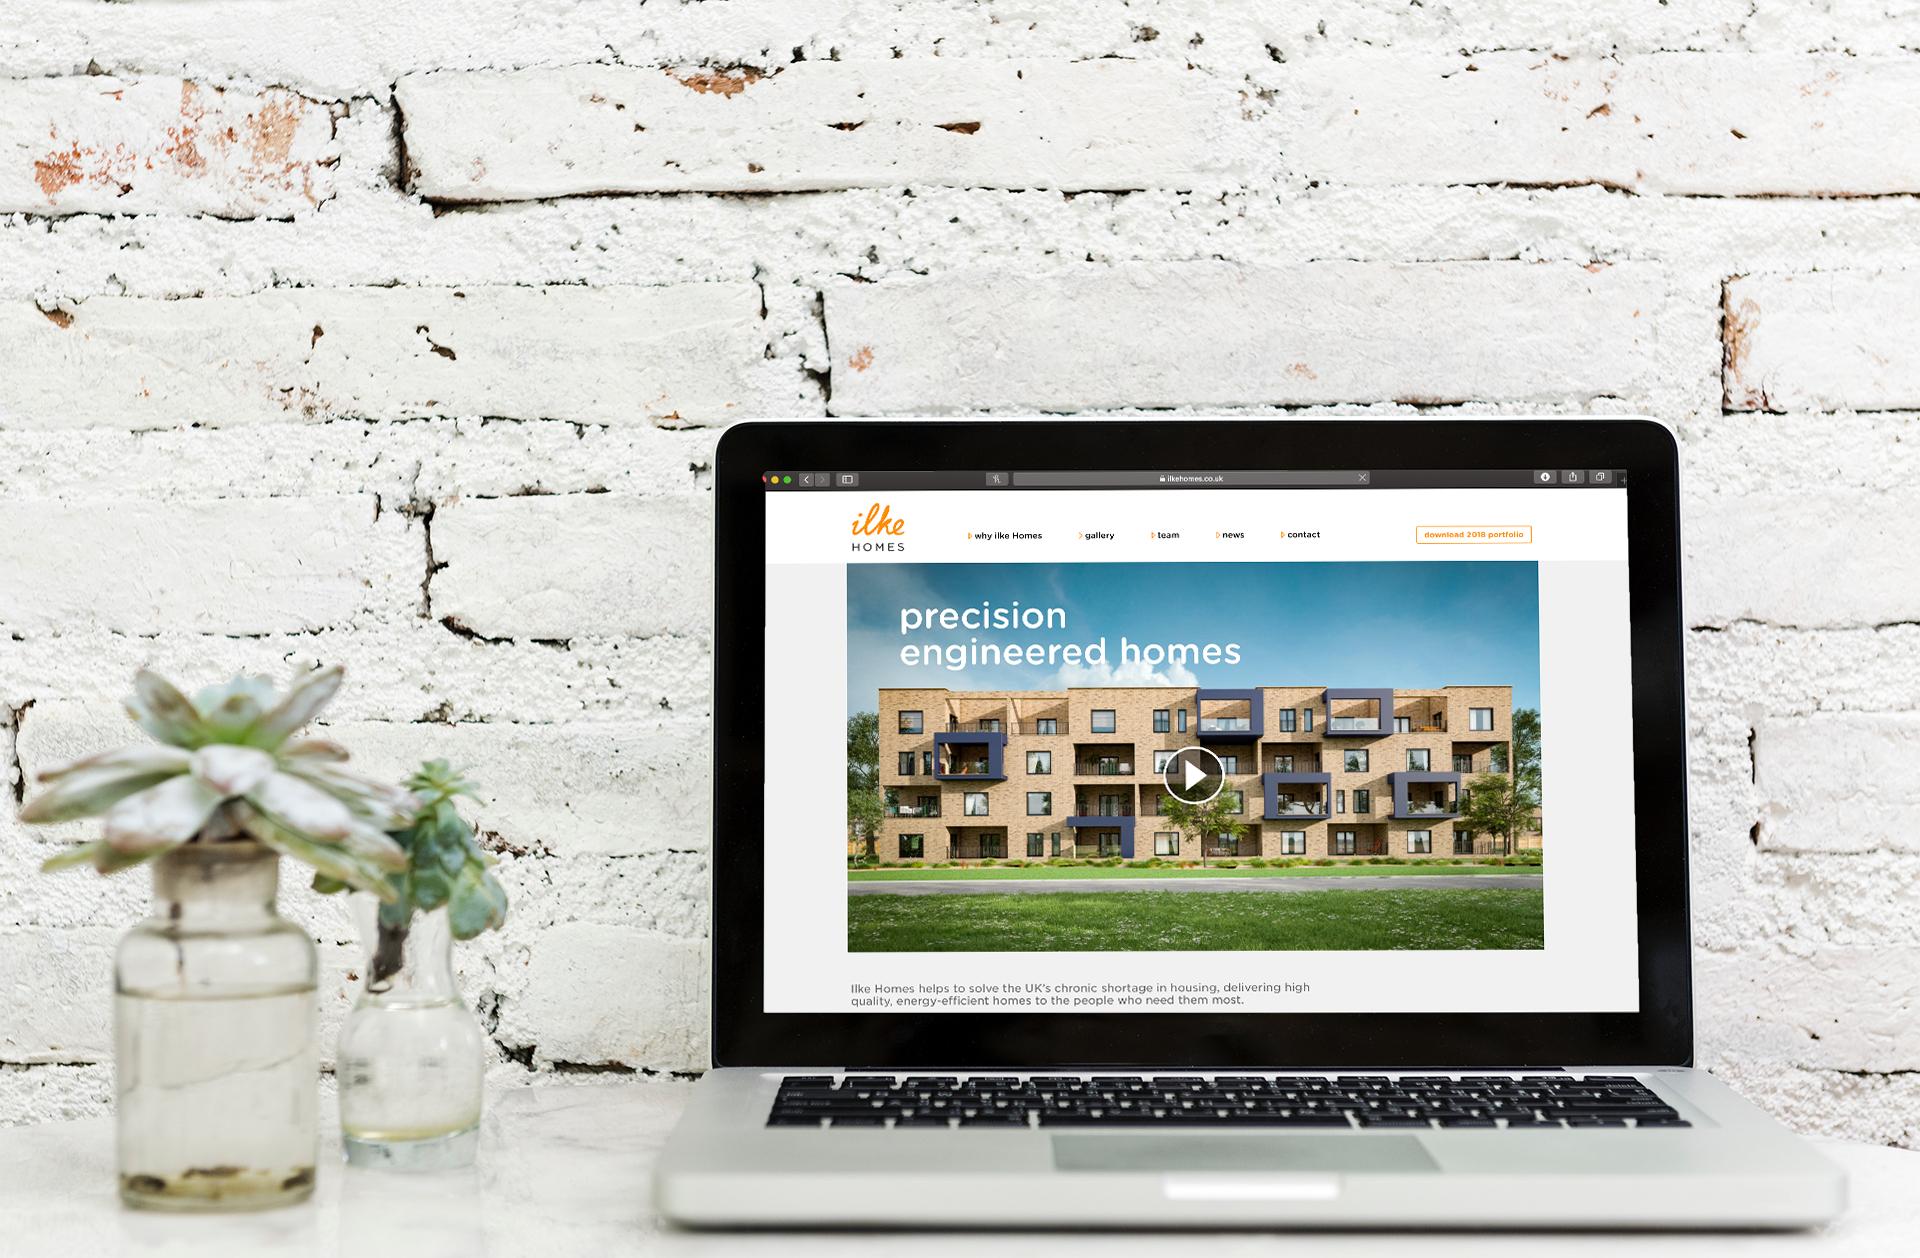 Ilke Homes landing page